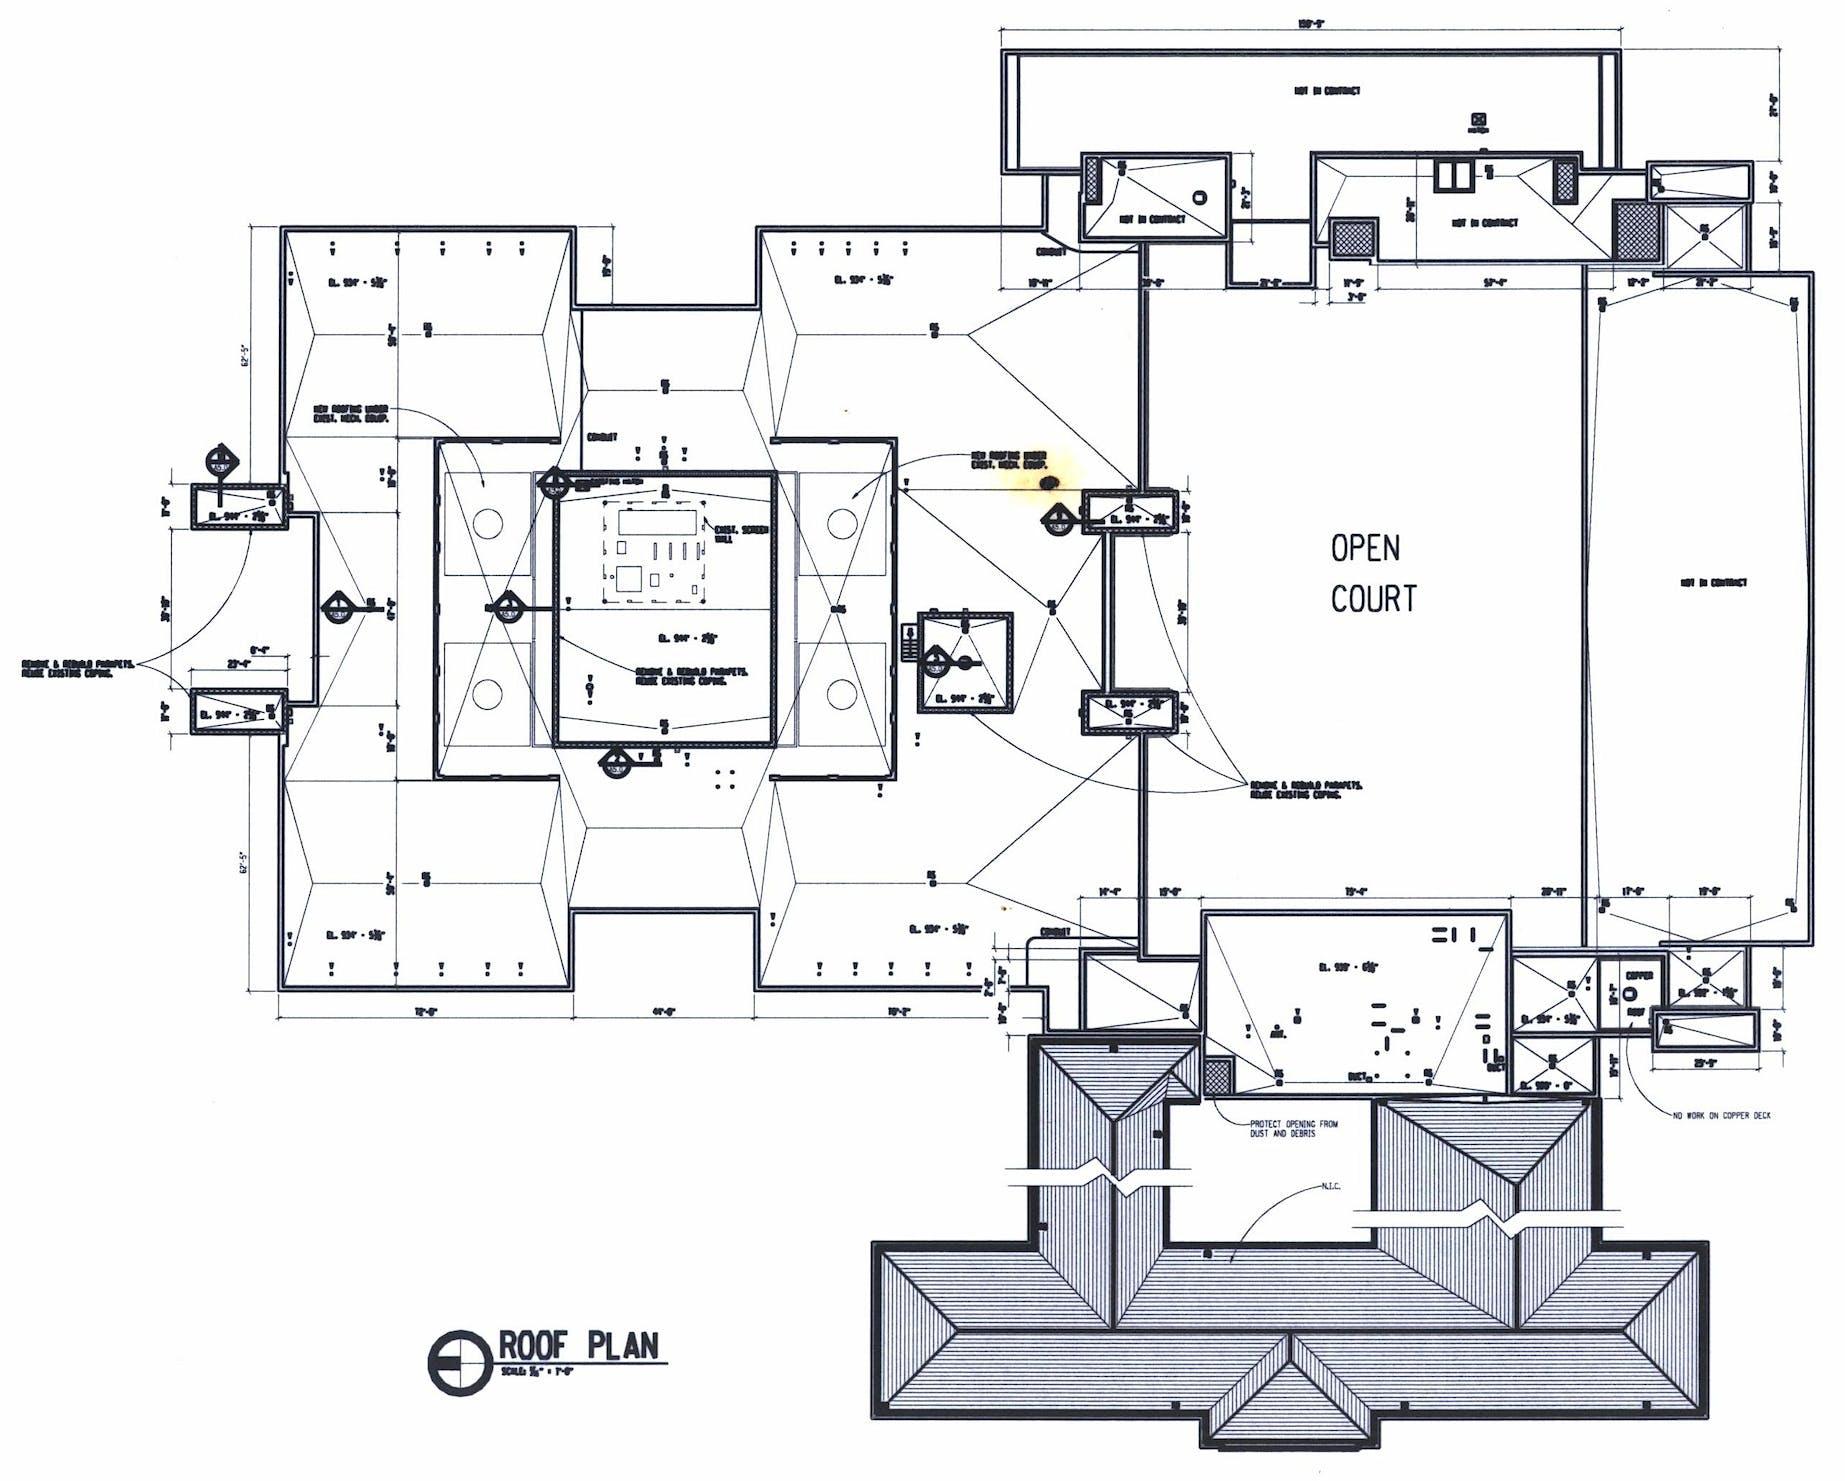 facility planning part ii 06022018 free essay: facility planning-part ii carrie shellie cobbs facility planning hcs 446 terrie rill august 23, 2014 facility planning-part ii human.